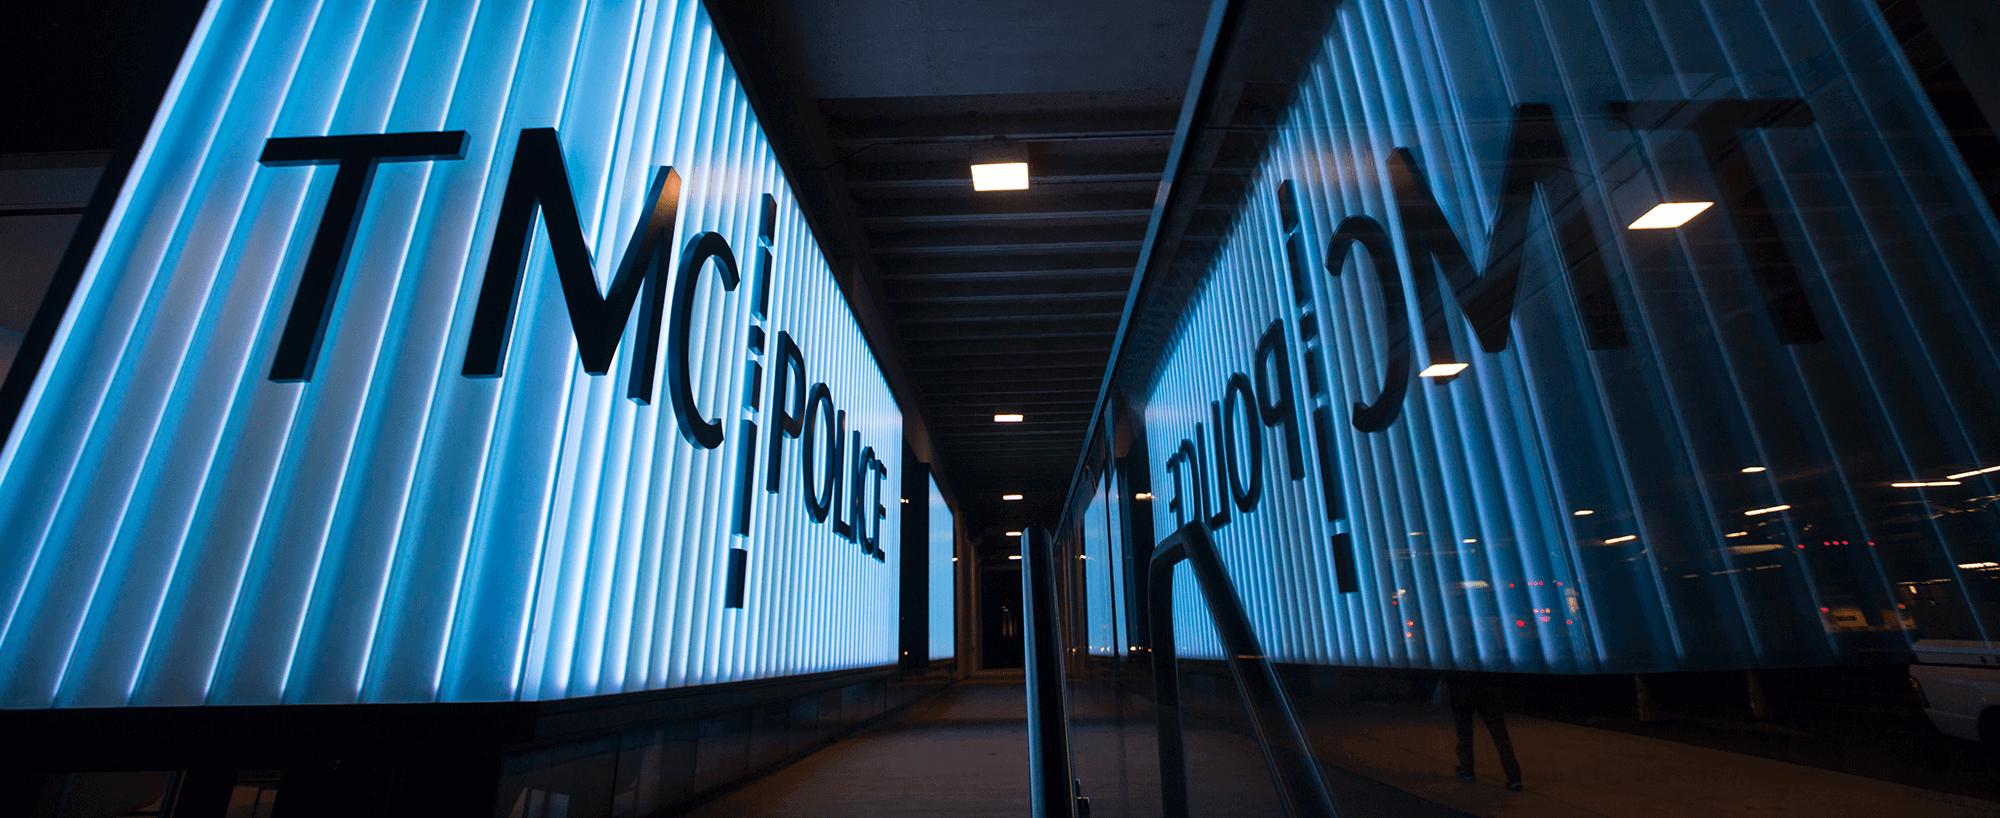 tmc-police-banner